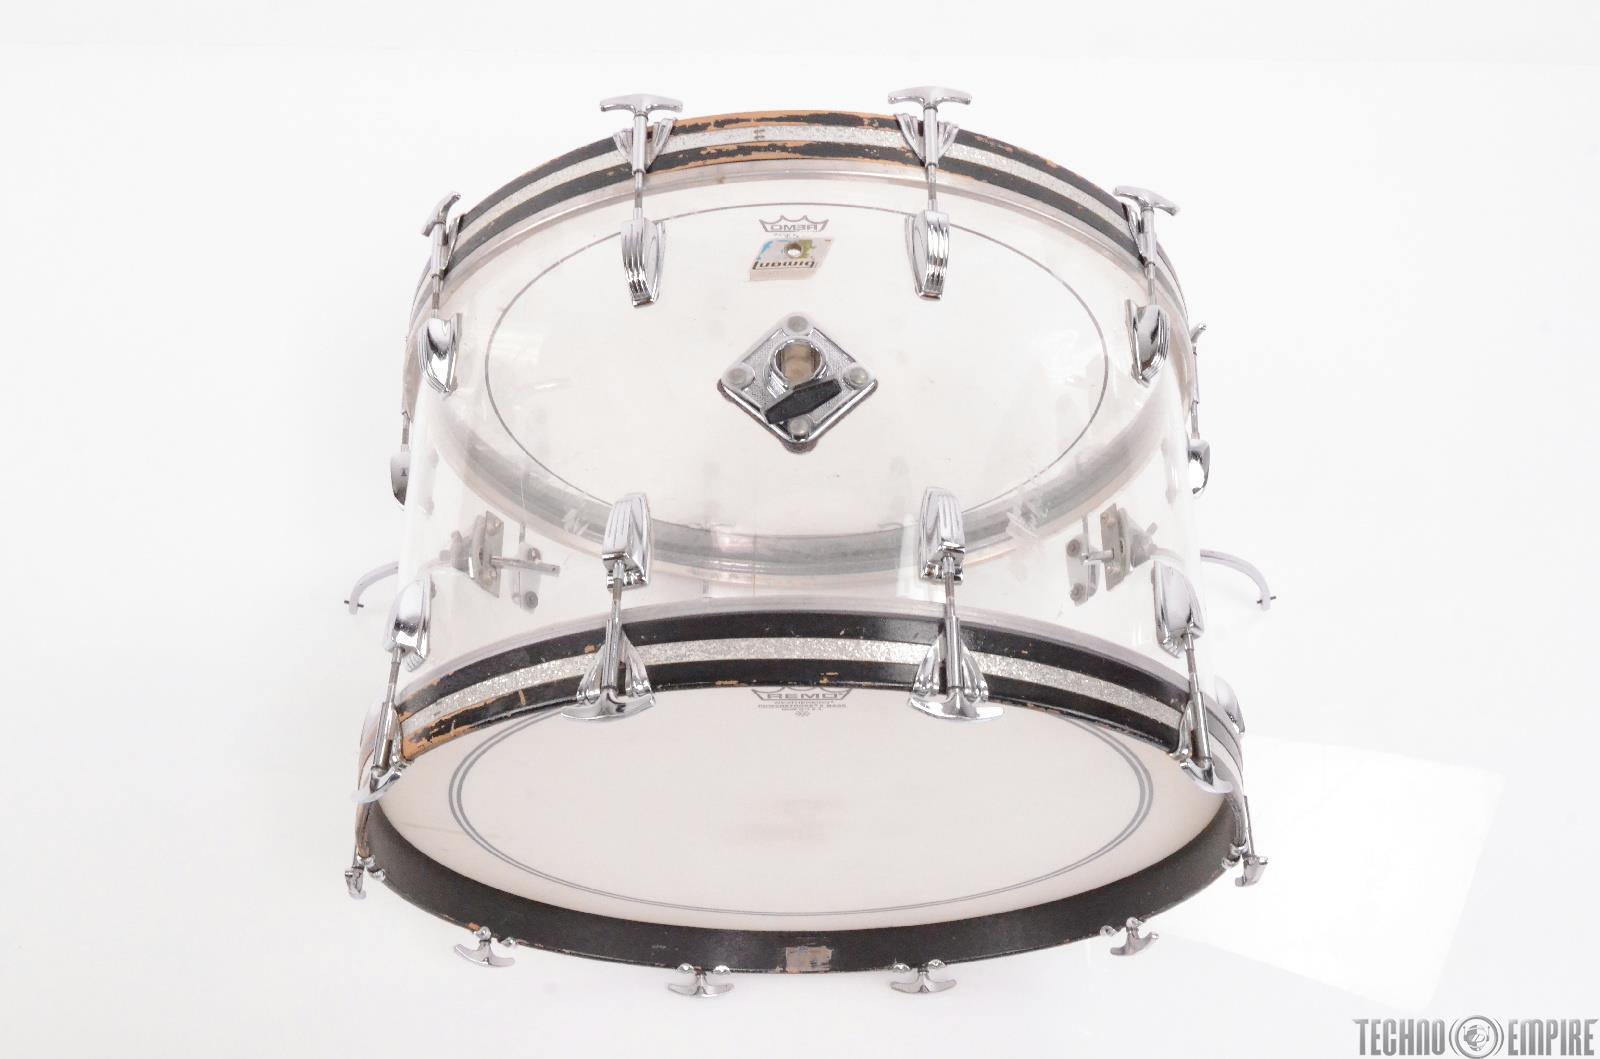 1970 39 s ludwig vistalite 9 piece clear acrylic drum set w beato cases 27783. Black Bedroom Furniture Sets. Home Design Ideas